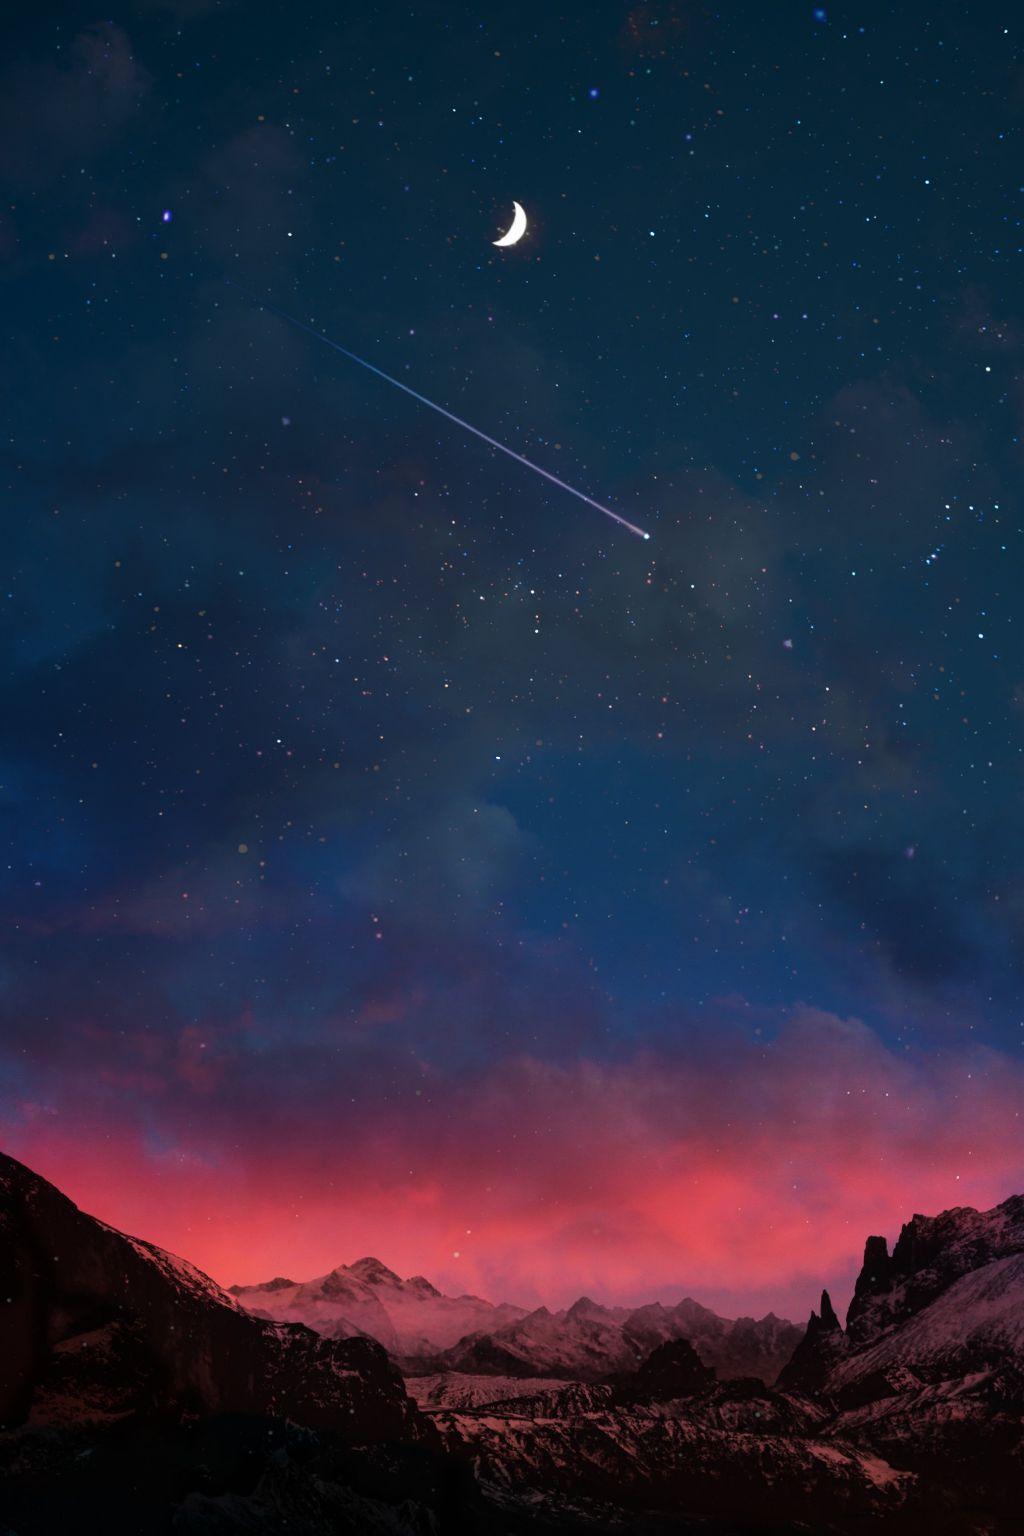 #freetoedit #background #madewithpicsart #night #sky #stars #moon #mountains